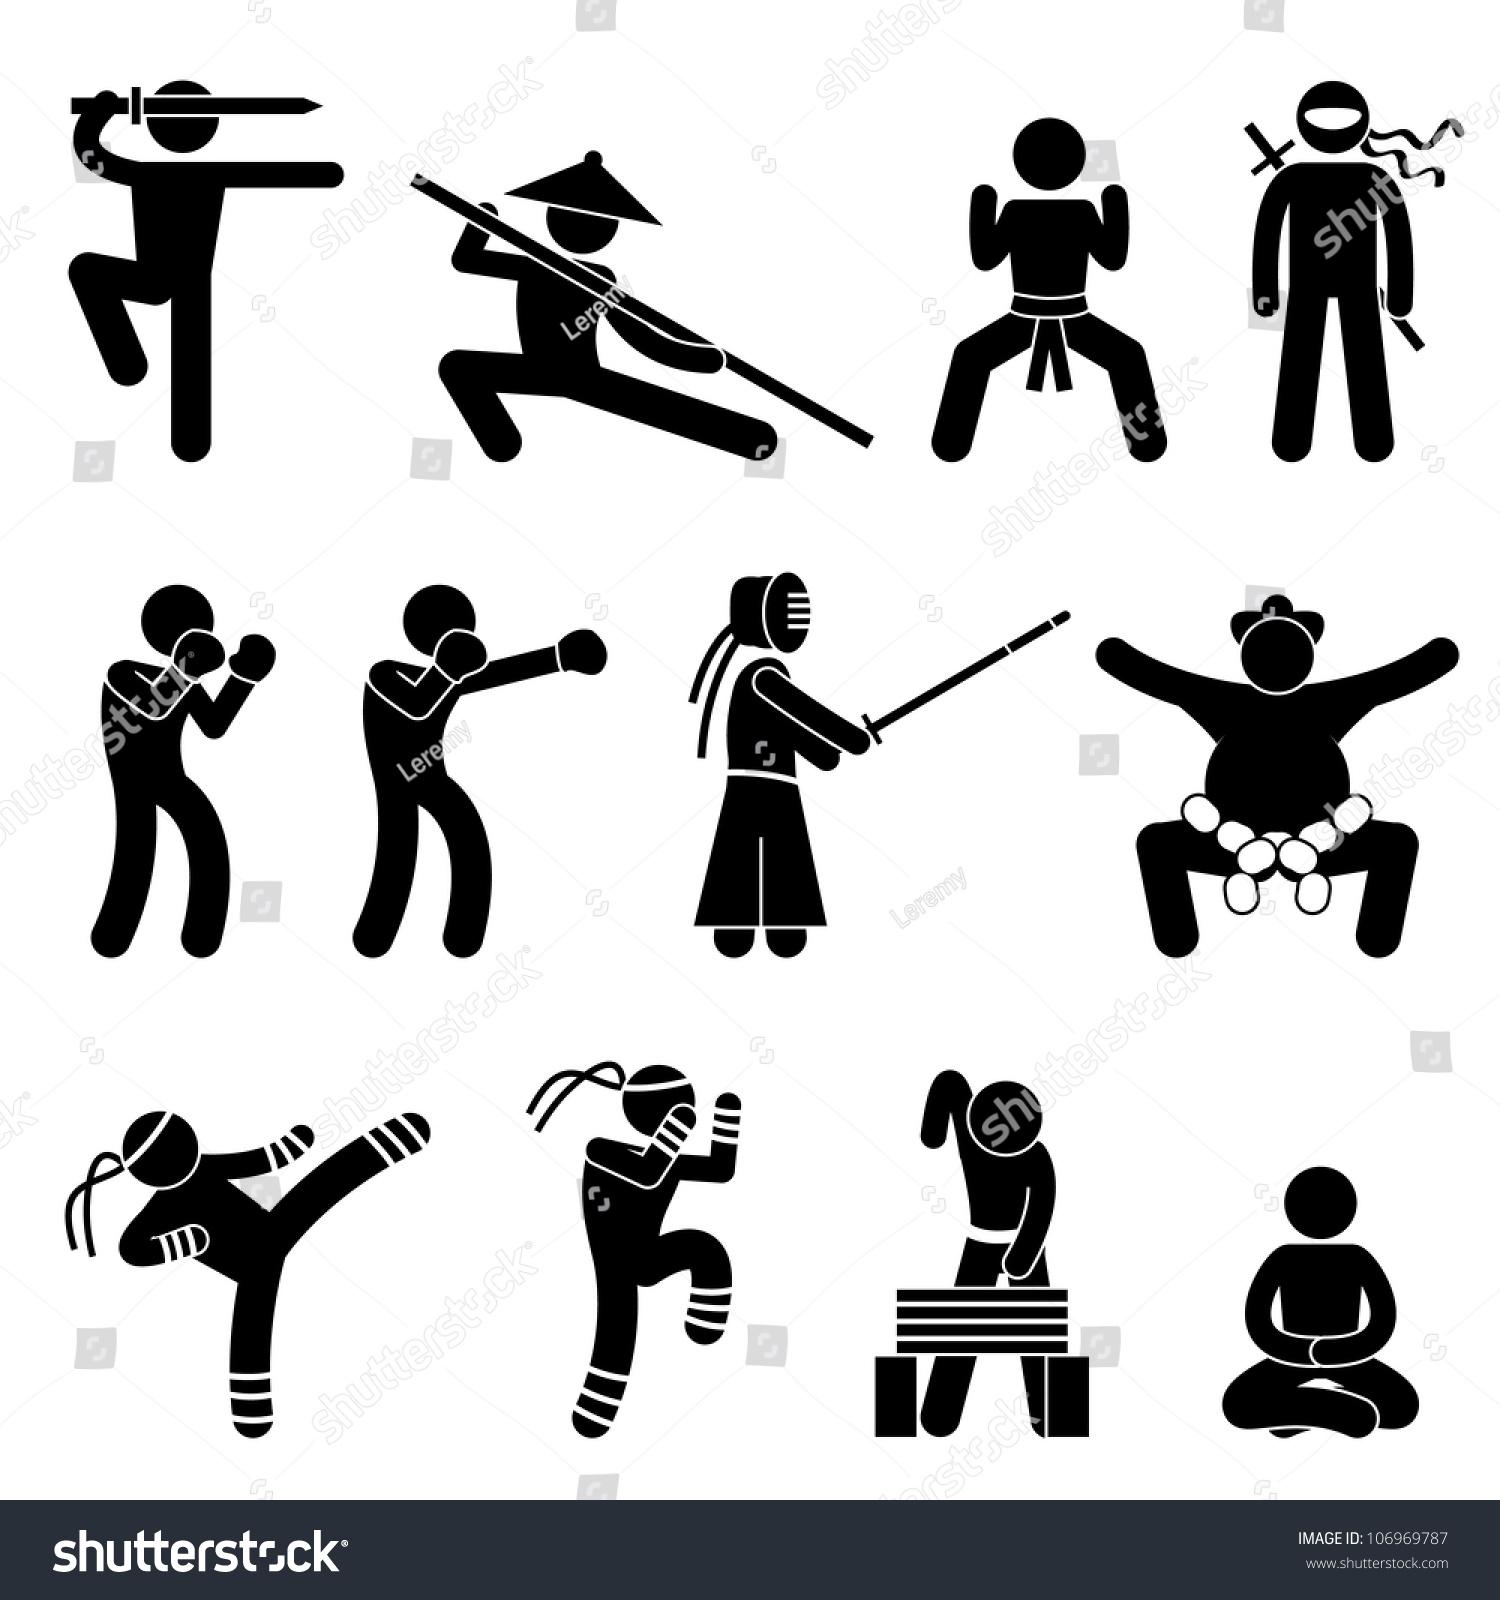 Royalty Free Stock Illustration Of Kung Fu Martial Arts Self Defense